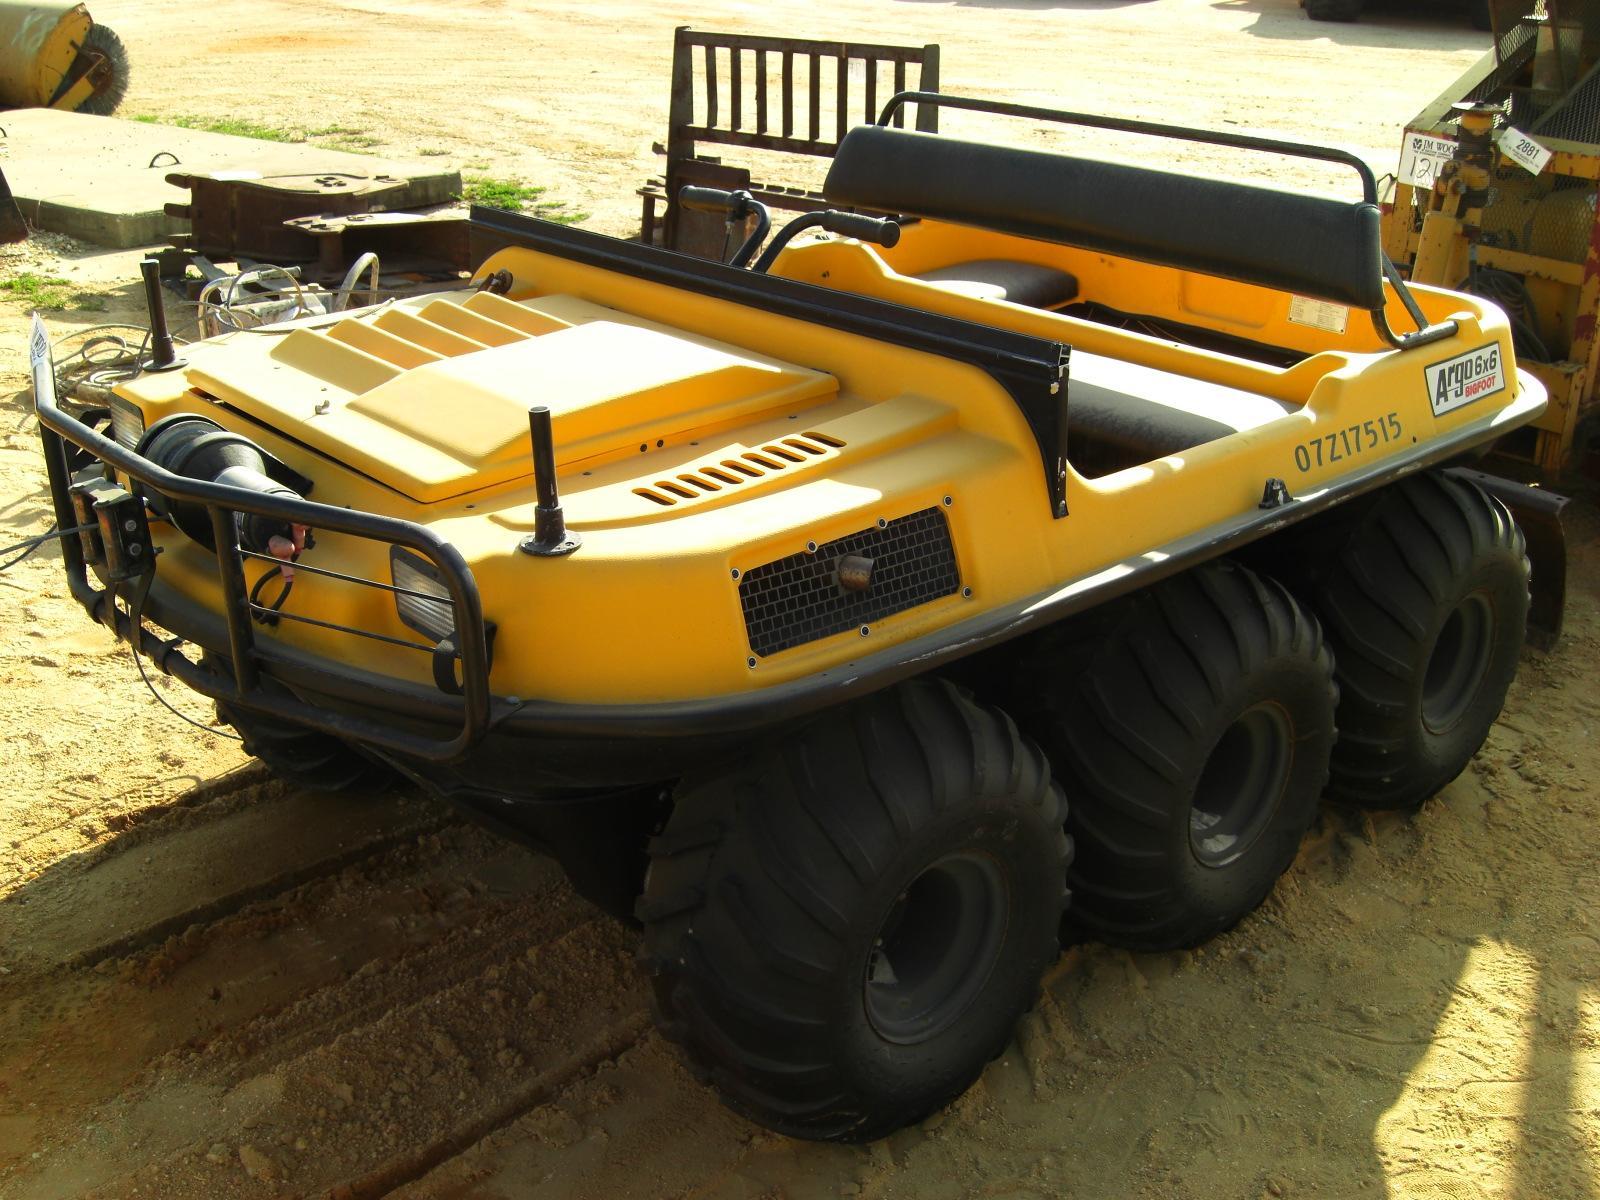 ARGO 6X6 BIGFOOT AMPHIBIOUS ATV